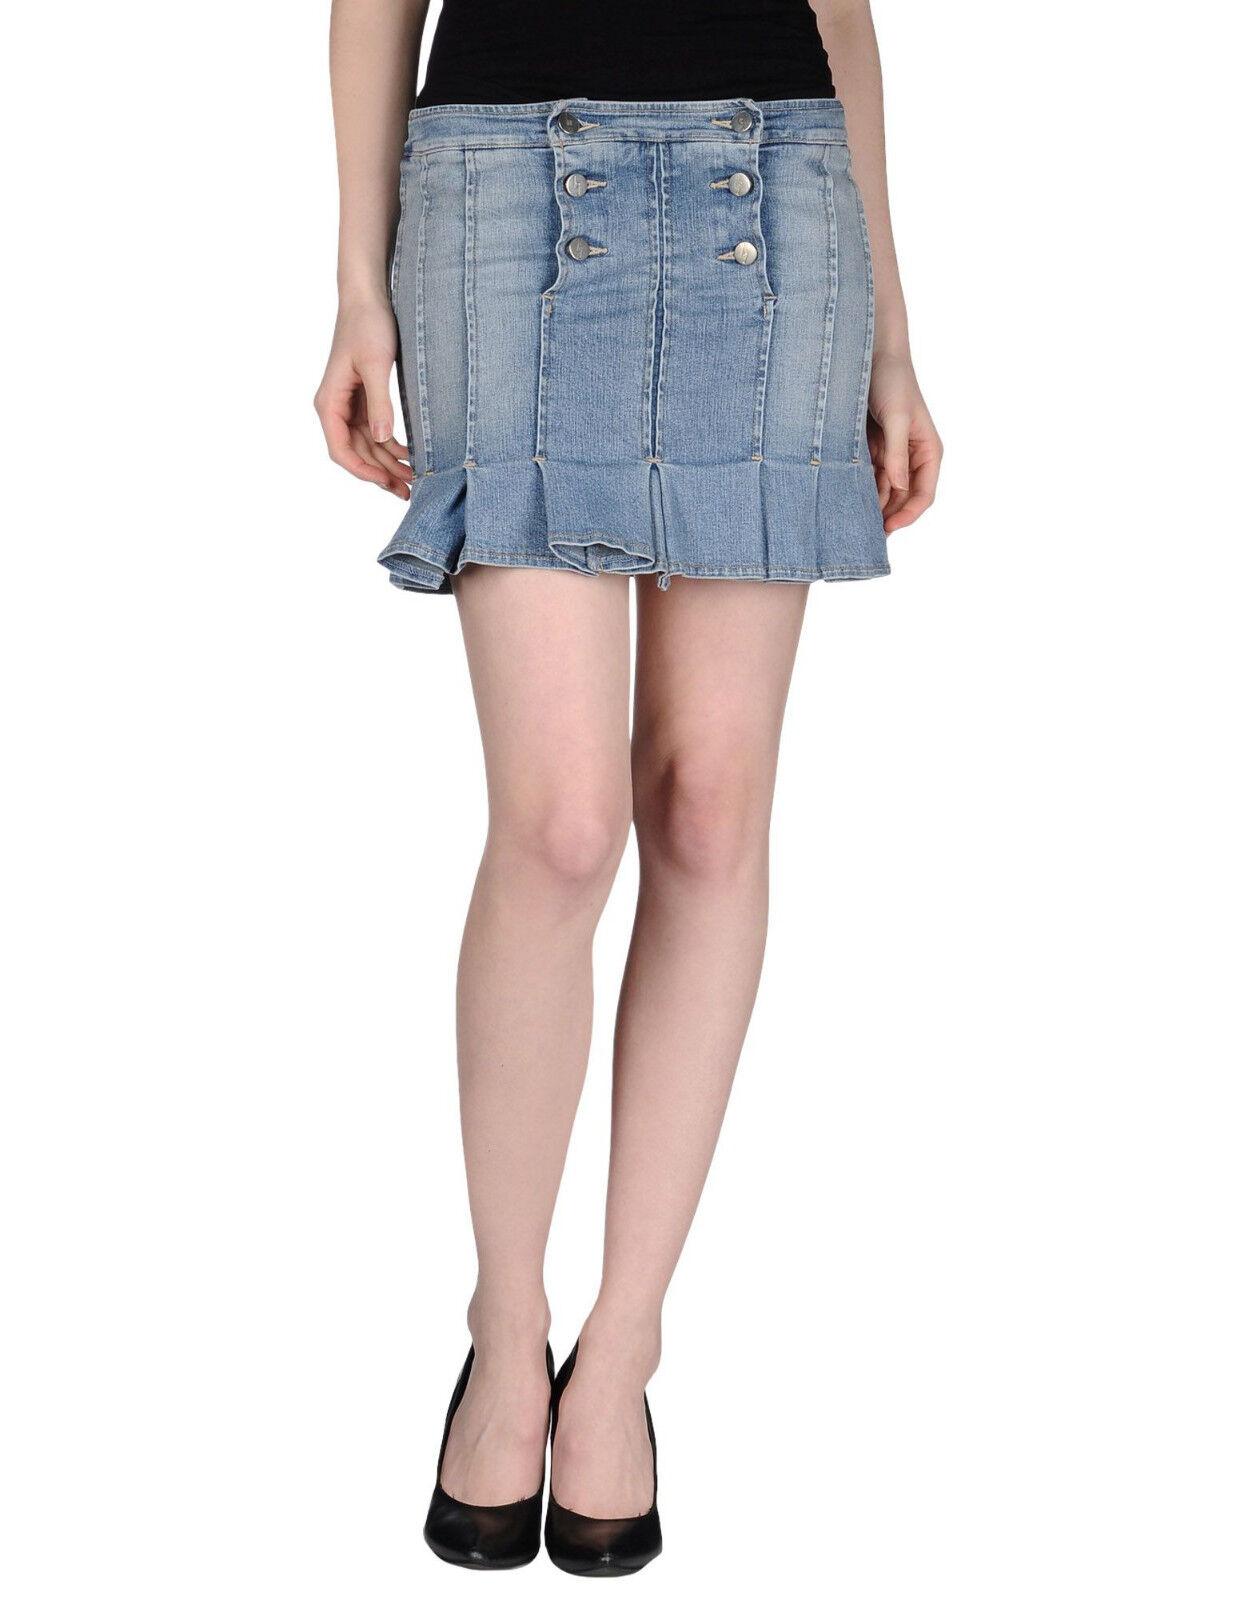 DIESEL Lagerfeld Gallery Denim Skirt Jean Denim Skirt Size 27 NWT Made in